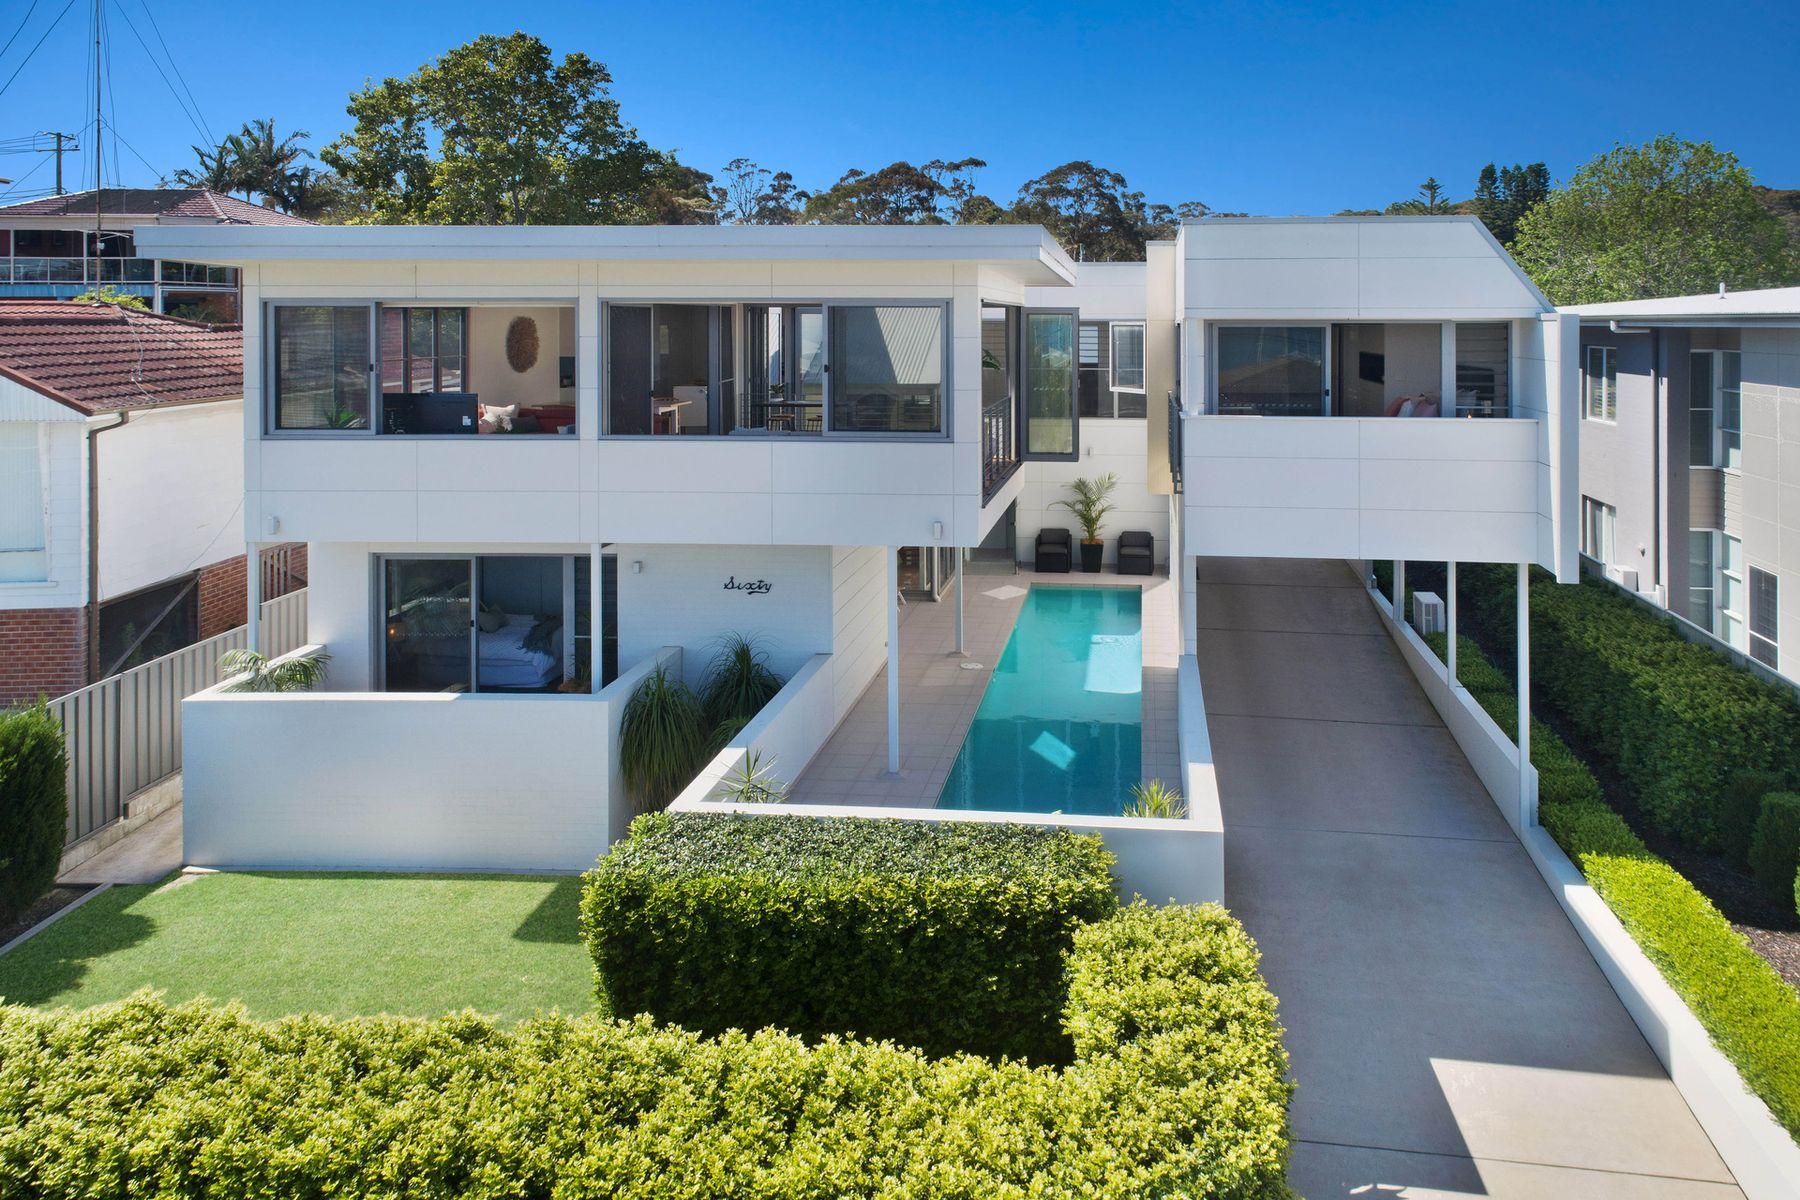 60 Dilkera Ave, Valentine NSW 2280, Australia, House for